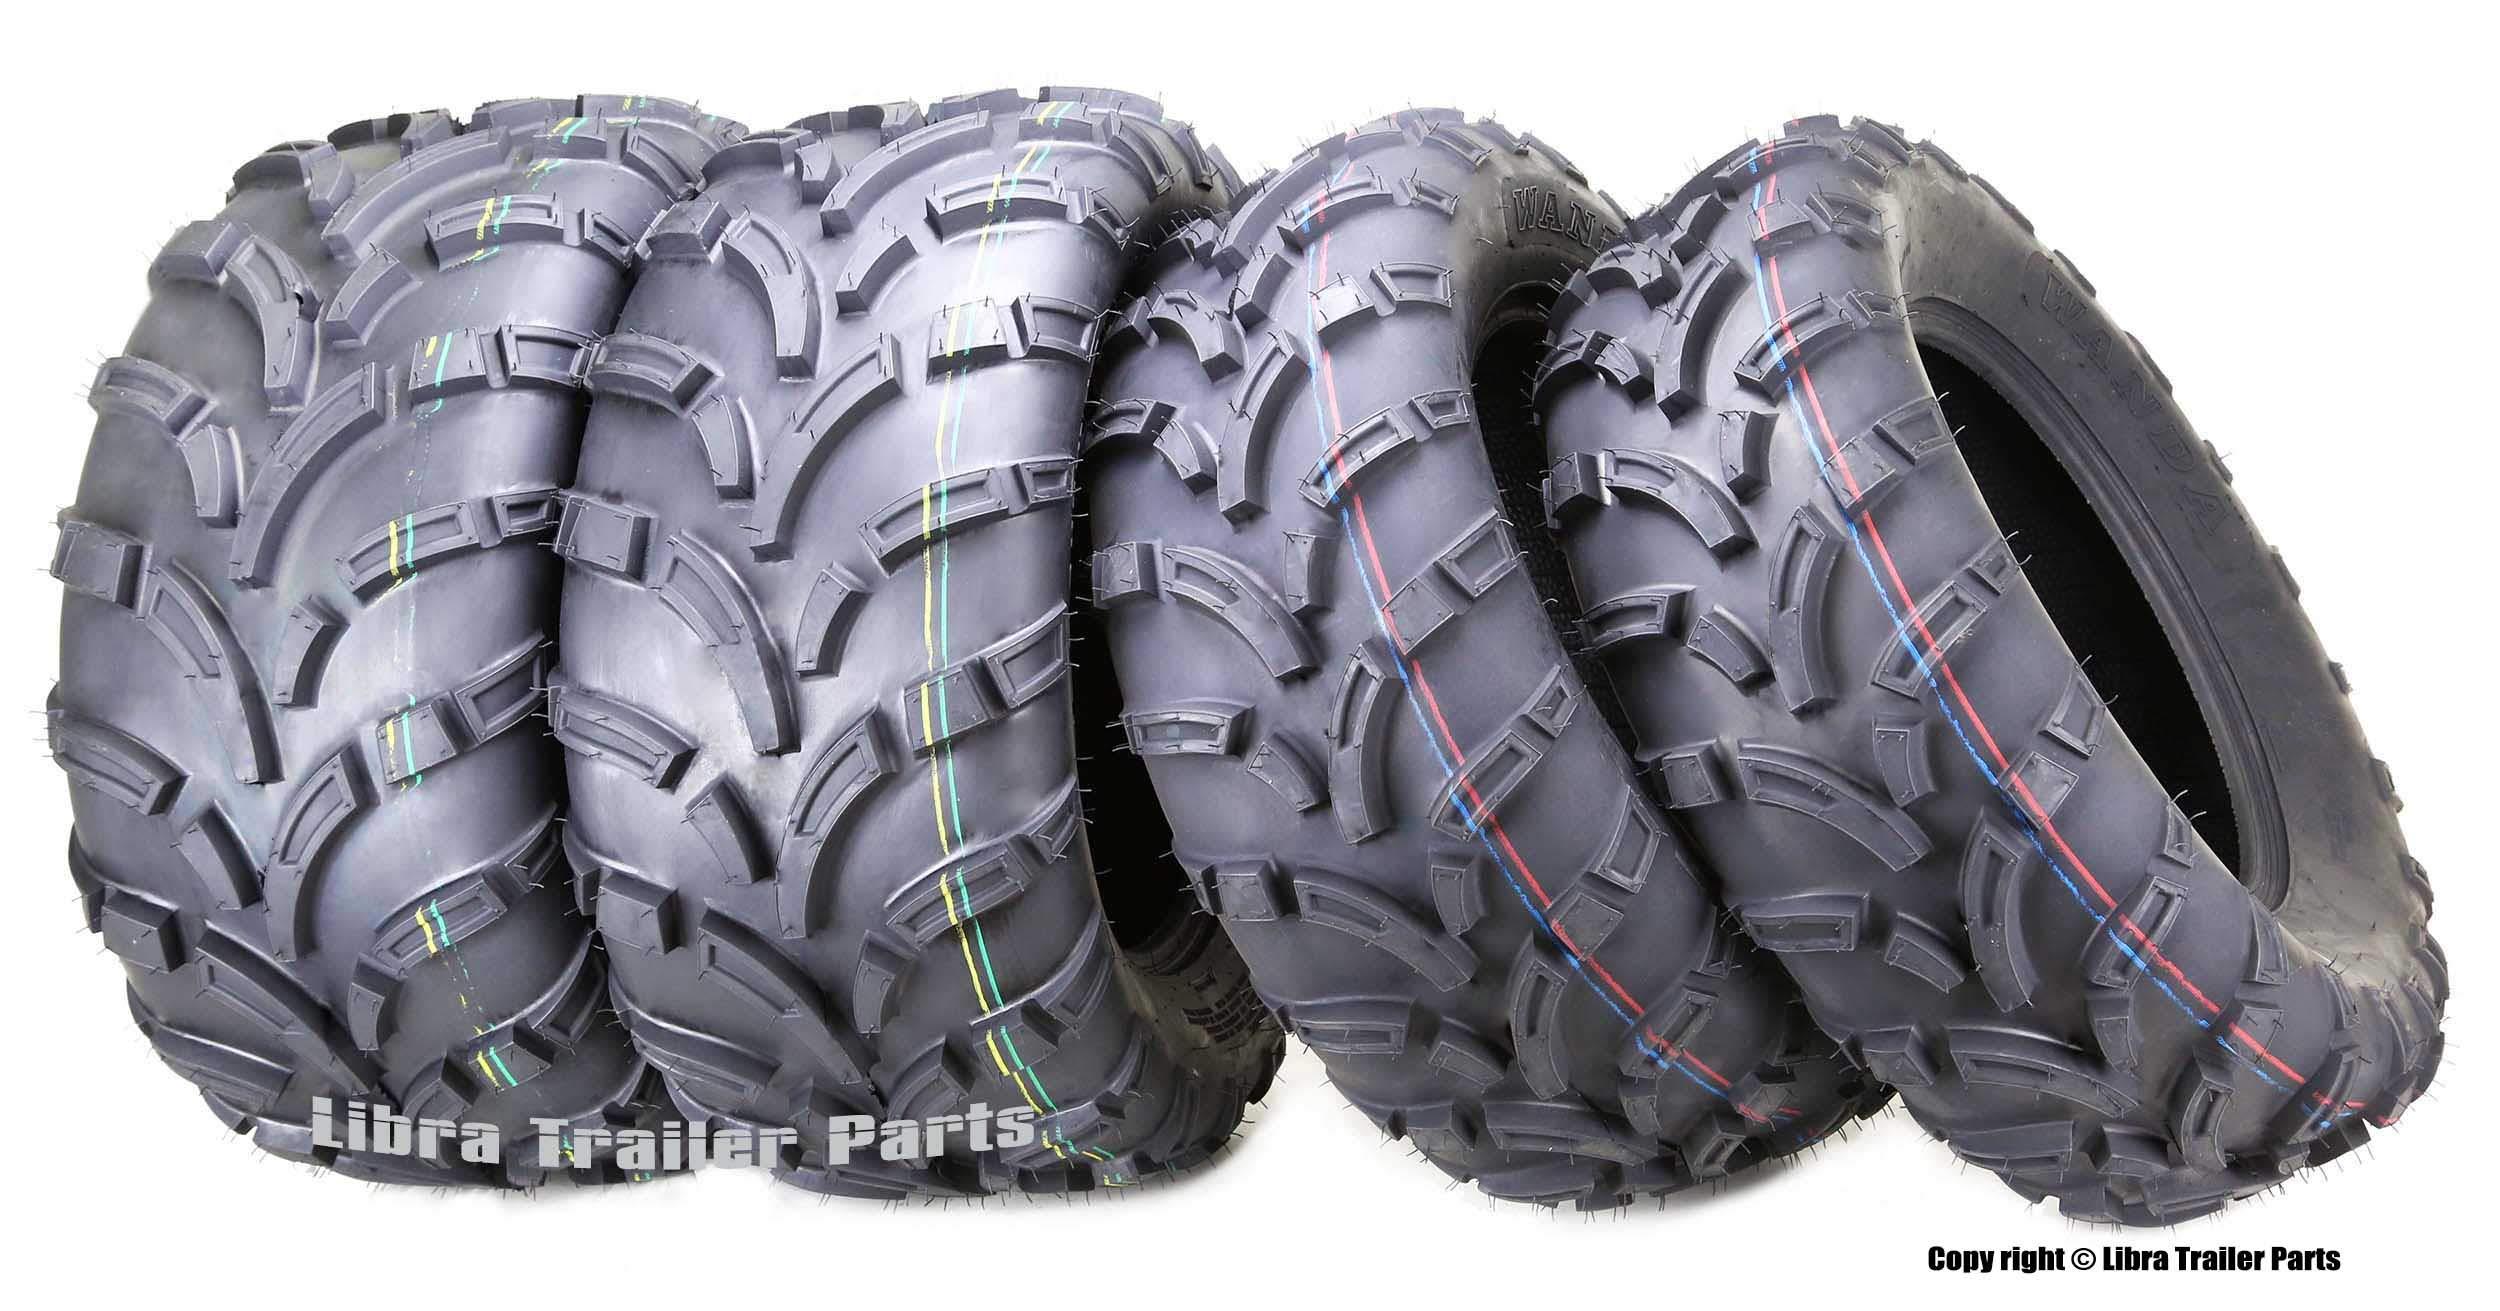 Set of 4 WANDA ATV UTV Tires 26x9-14 Front & 26x11-14 Rear 6PR Mud by WANDA